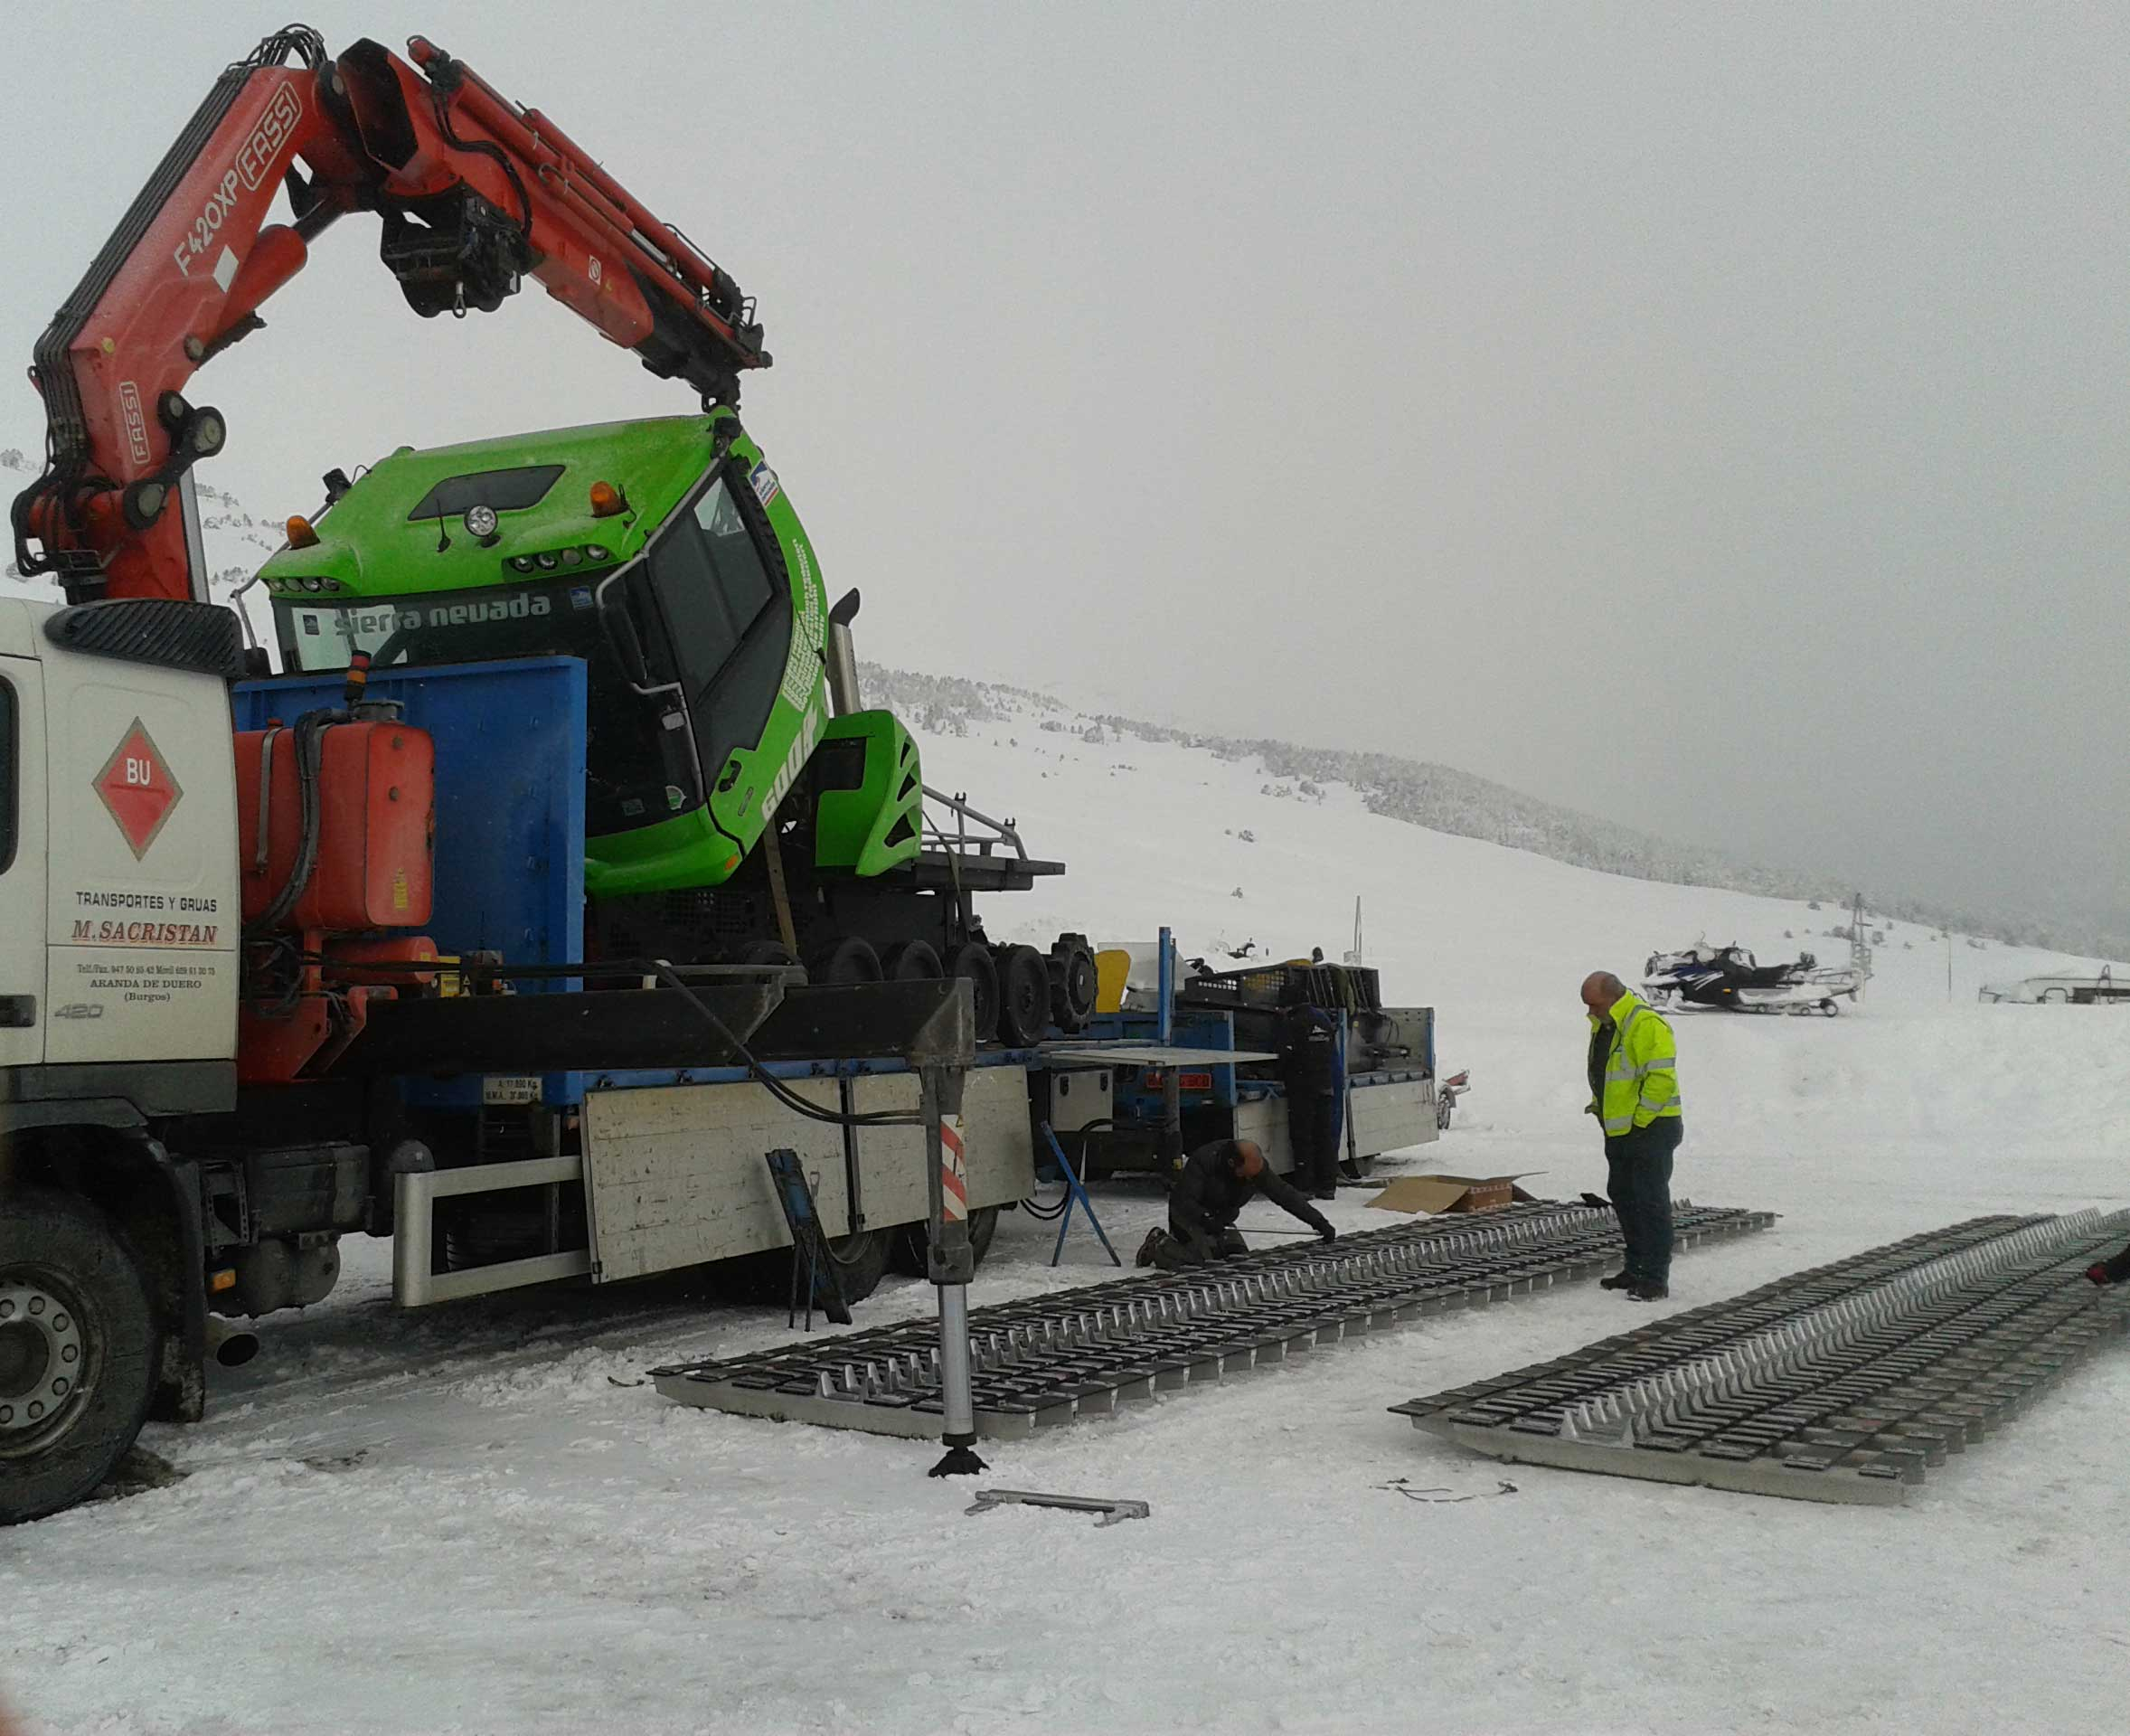 descarga maquina pisa nieves